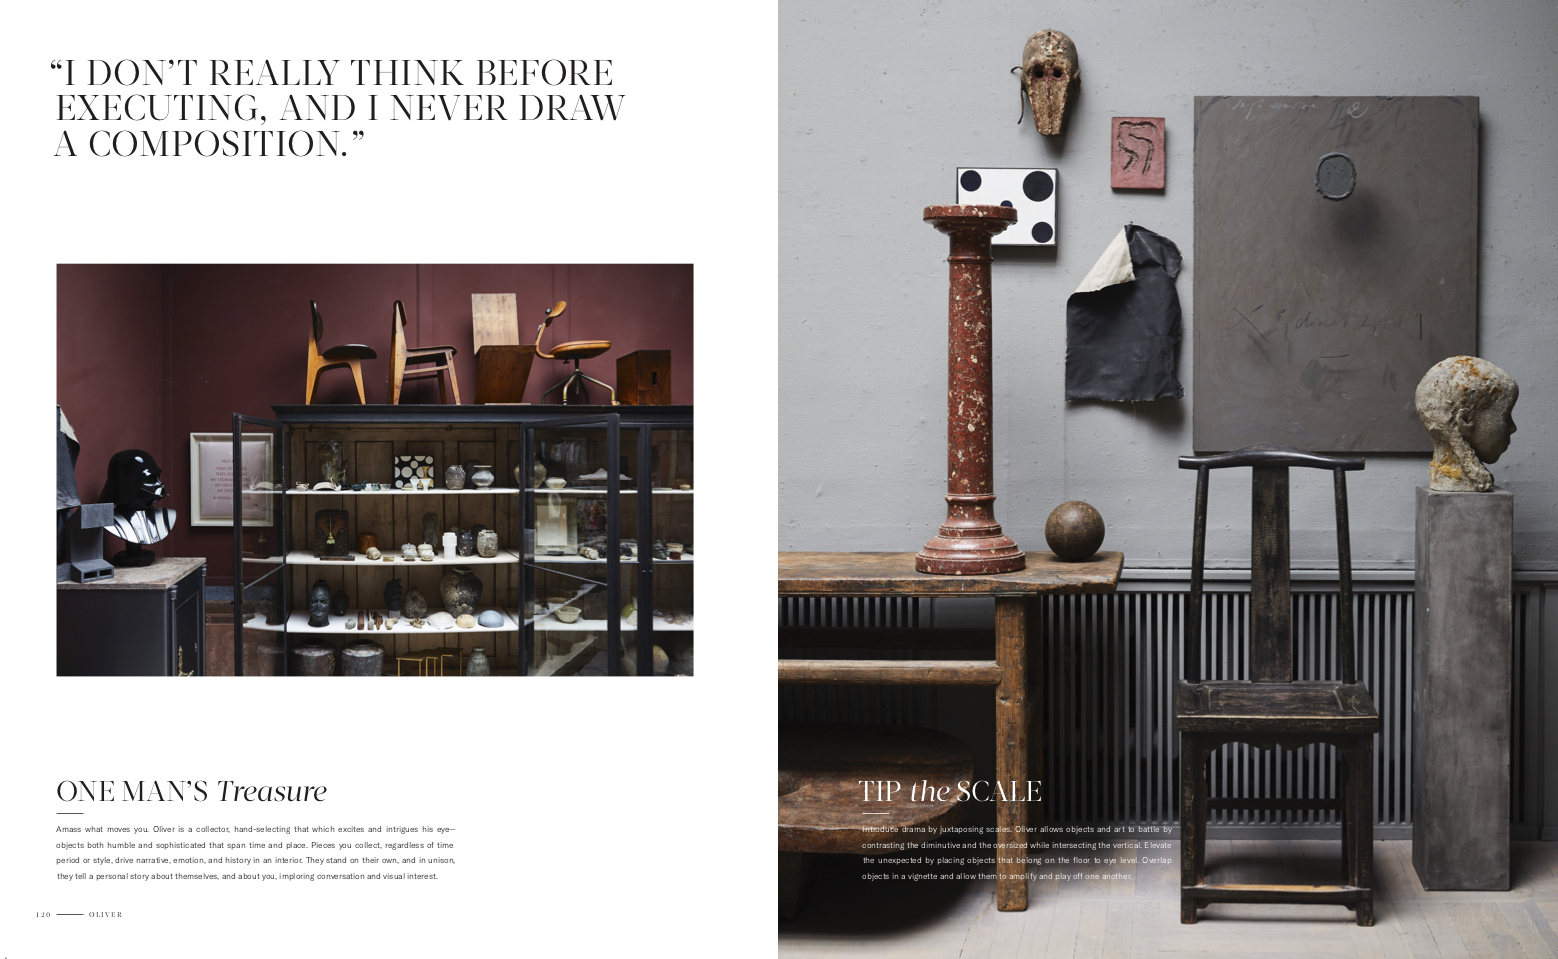 Live Beautiful interior design book featuring Oliver Gustav by Athena Calderone